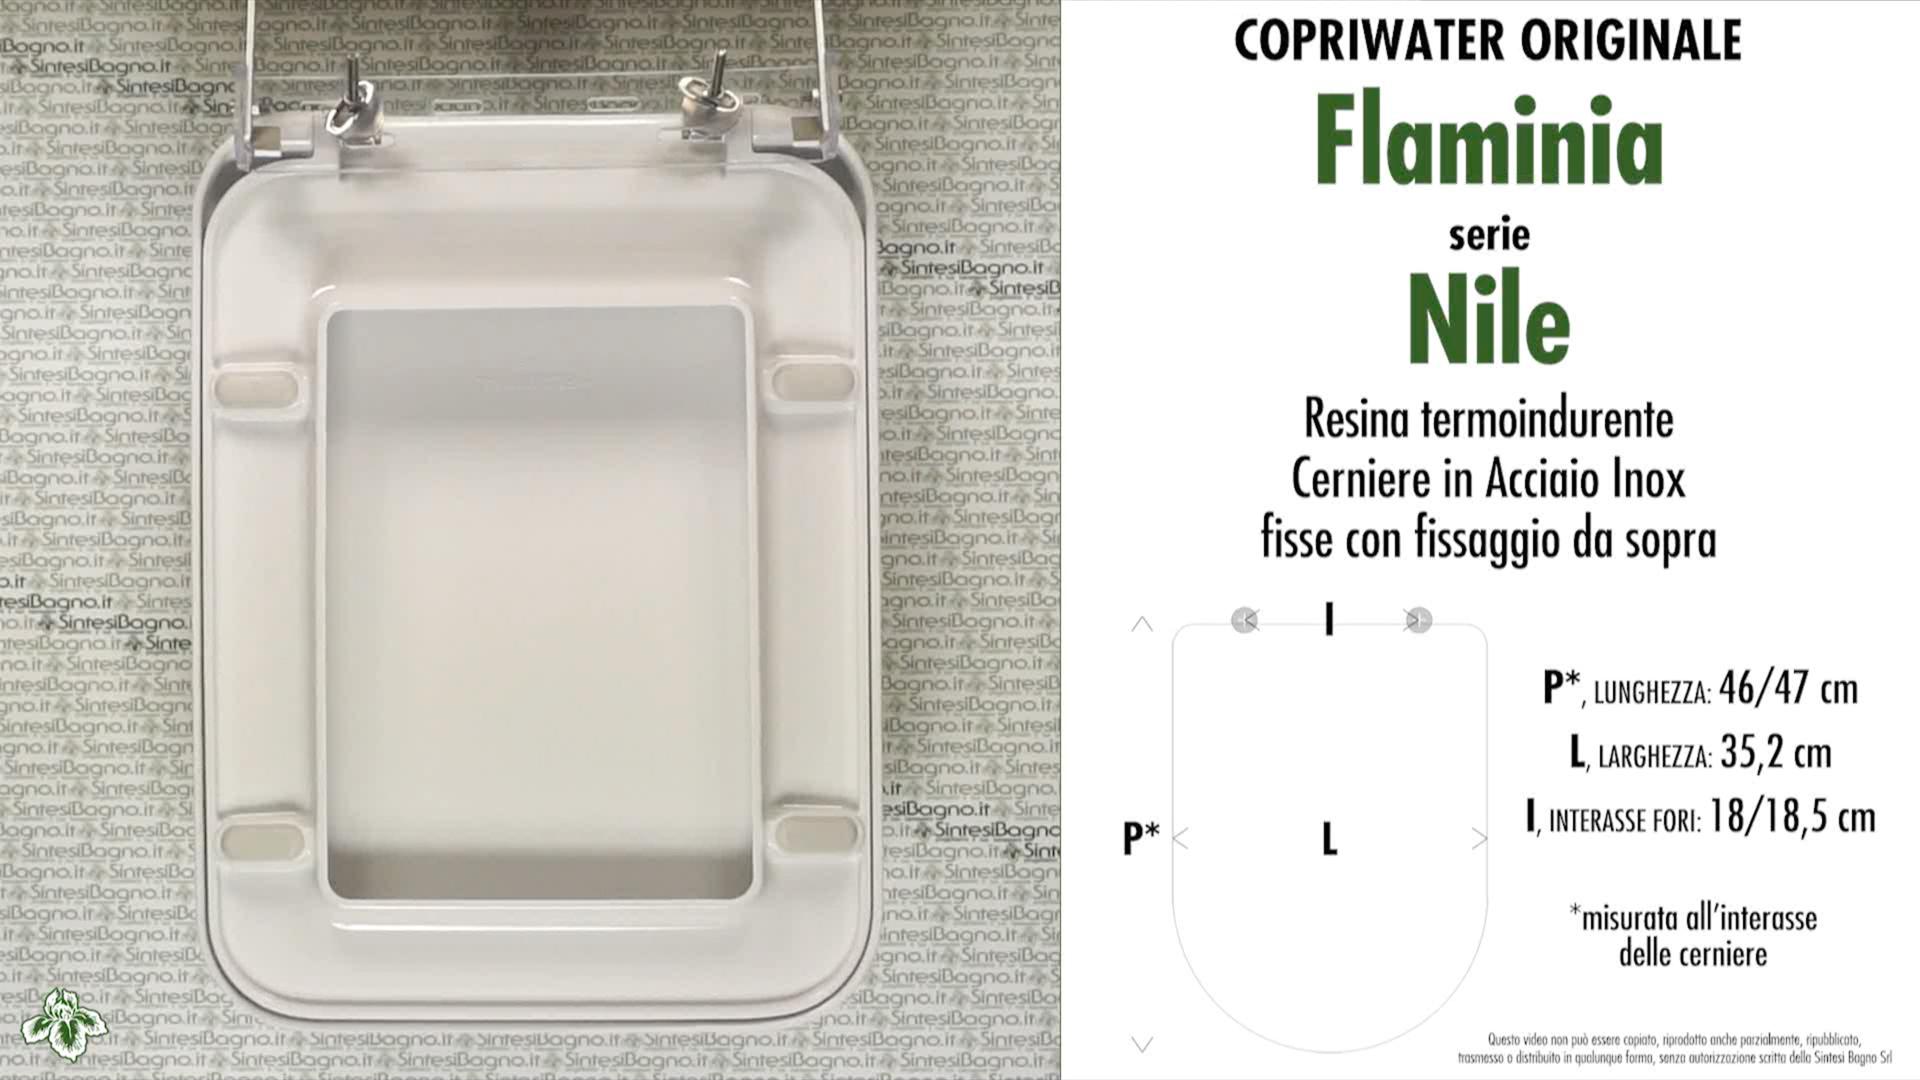 scheda-tecnica-datasheet-copriwater-originale-flaminia-serie-nile